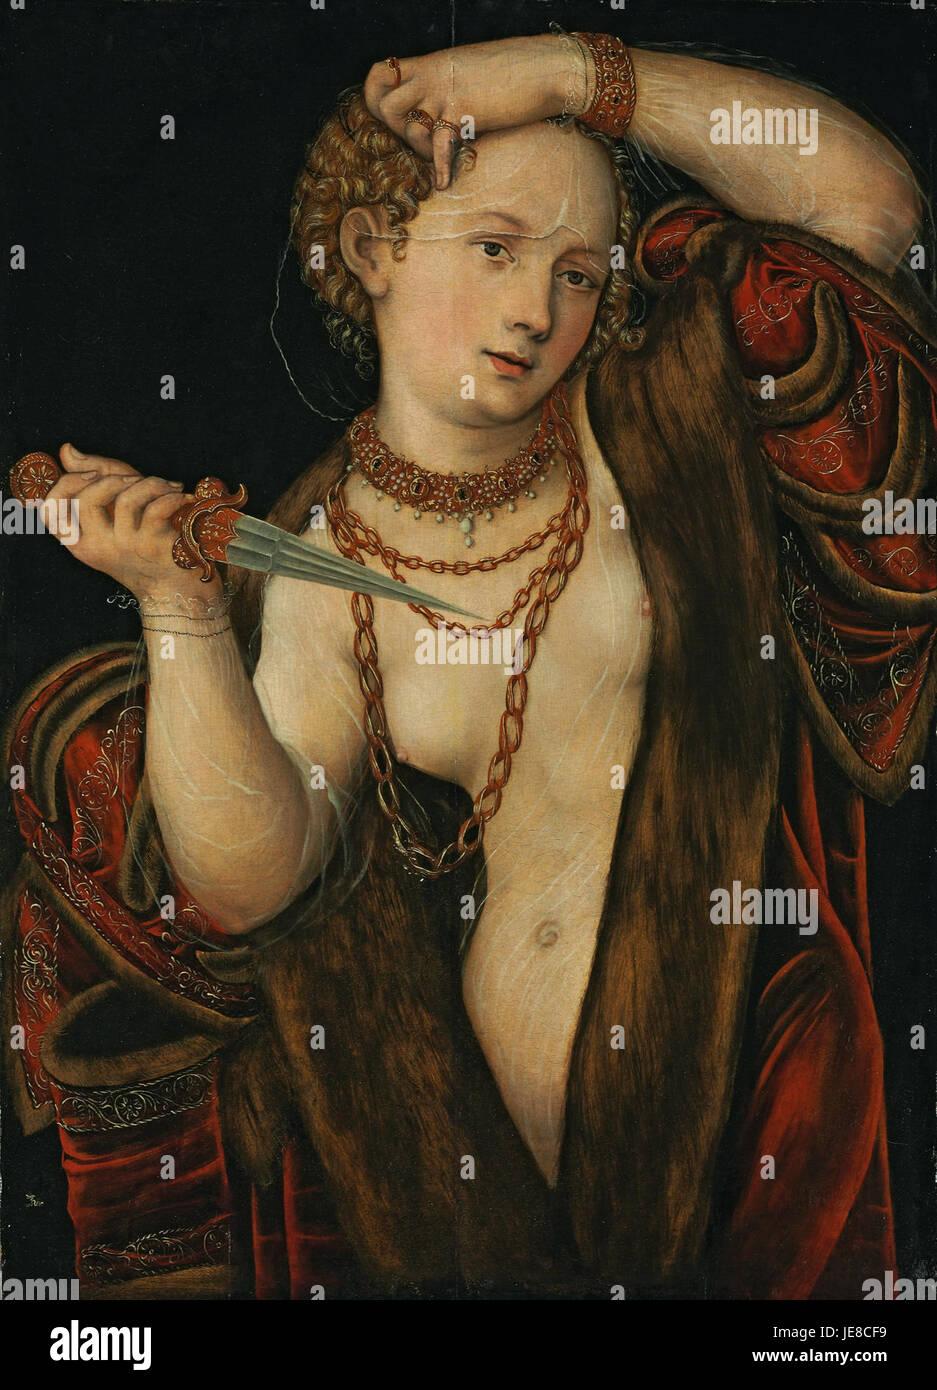 Lucas Cranach d.J. - Lucretia - Stock Image